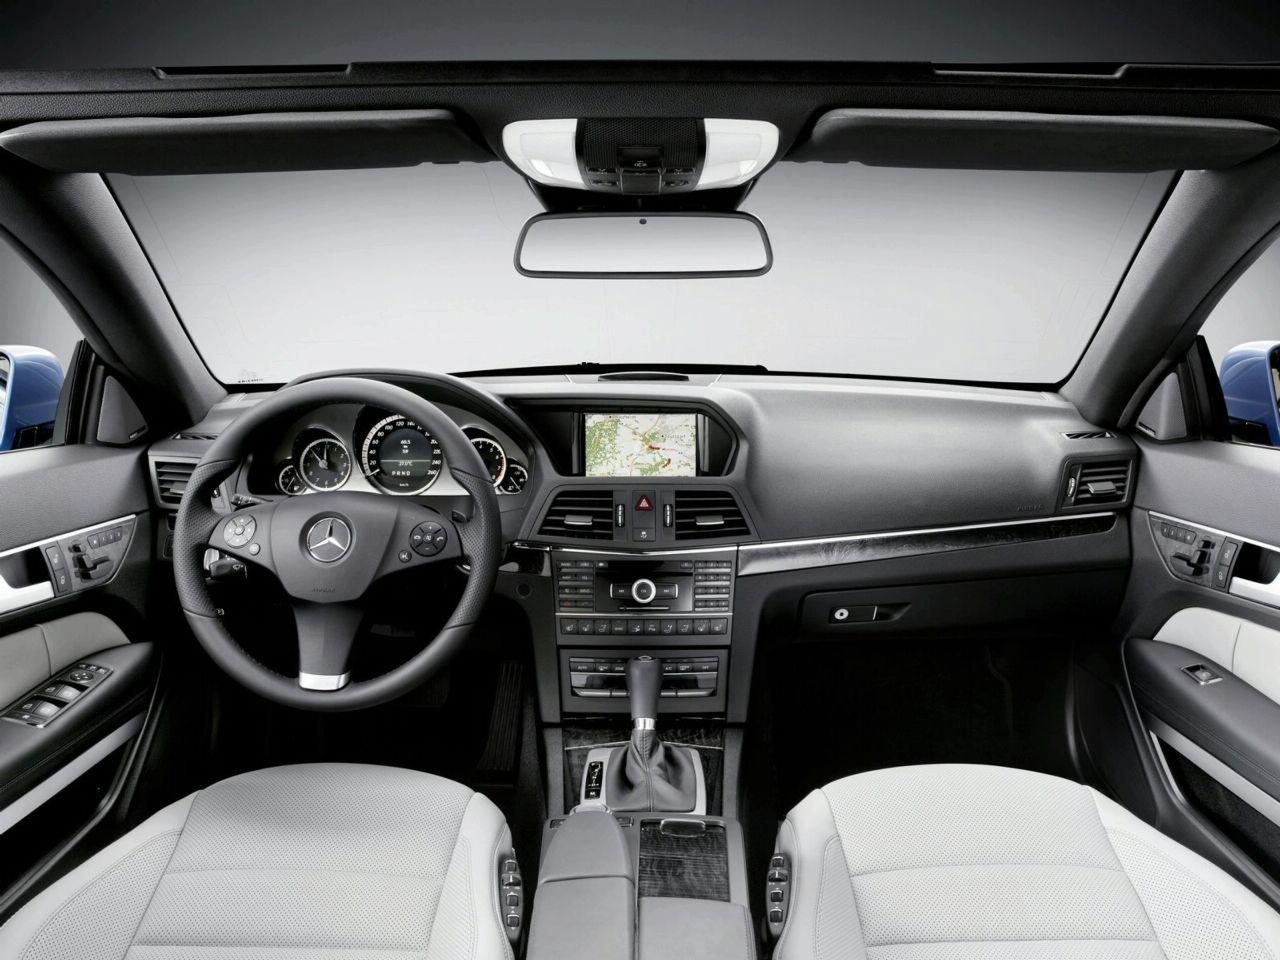 All Types 2011 e class : Mercedes-Benz E-Class Convertible 2010 img_11 | It's your auto ...